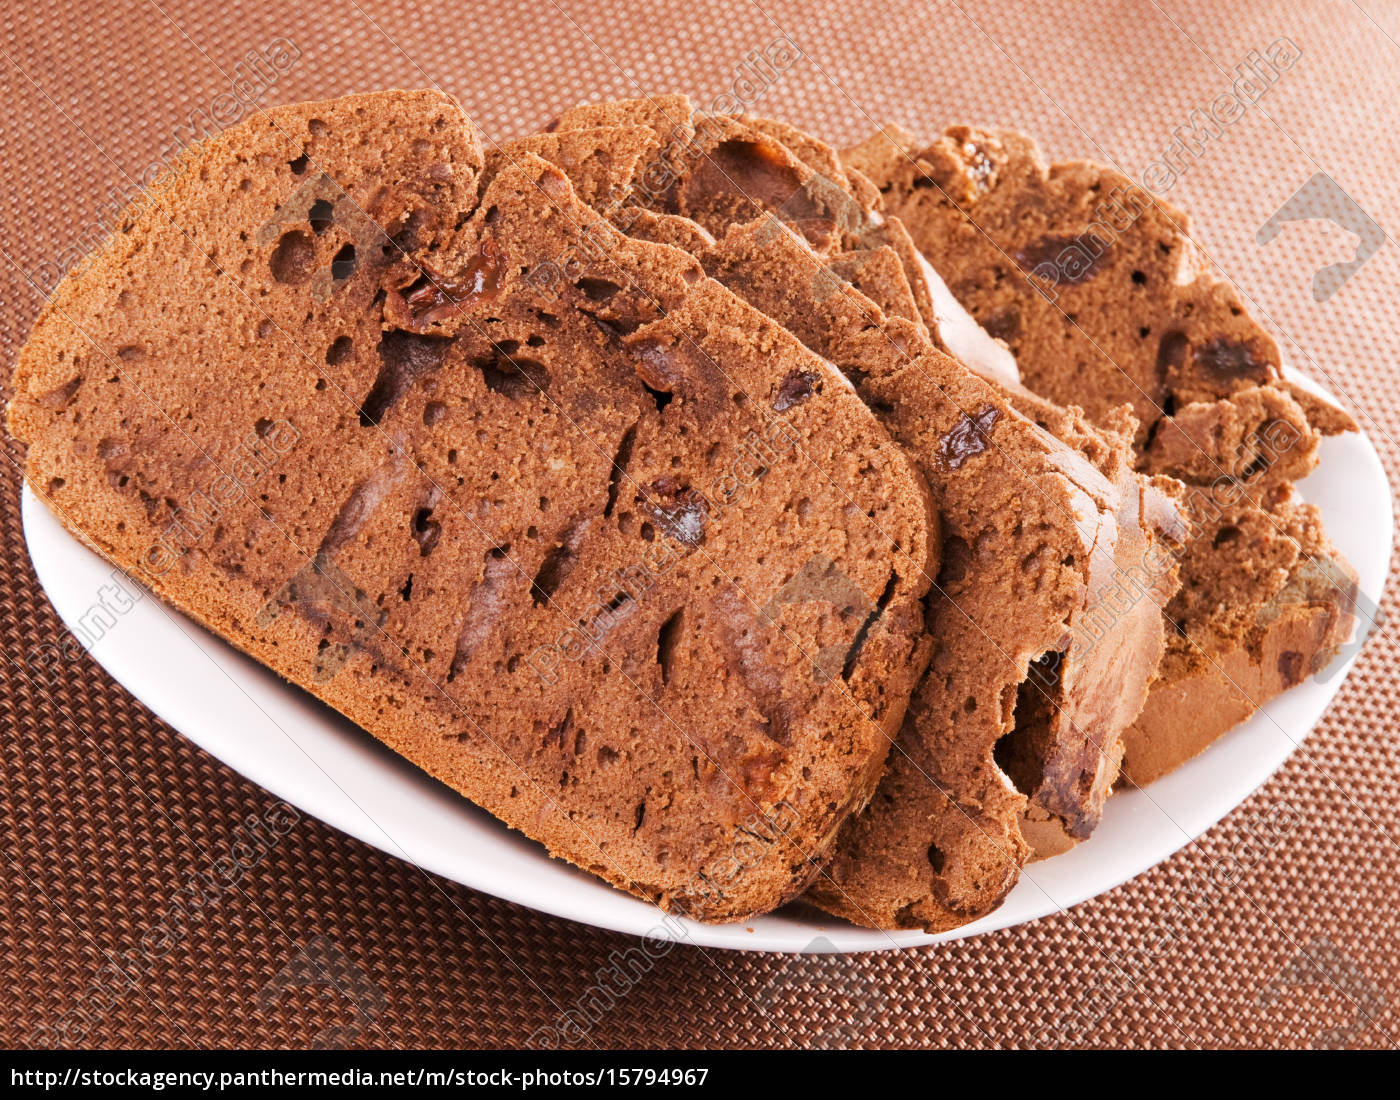 chocolate, cake, chocolate, cake, chocolate, cake, chocolate, cake - 15794967